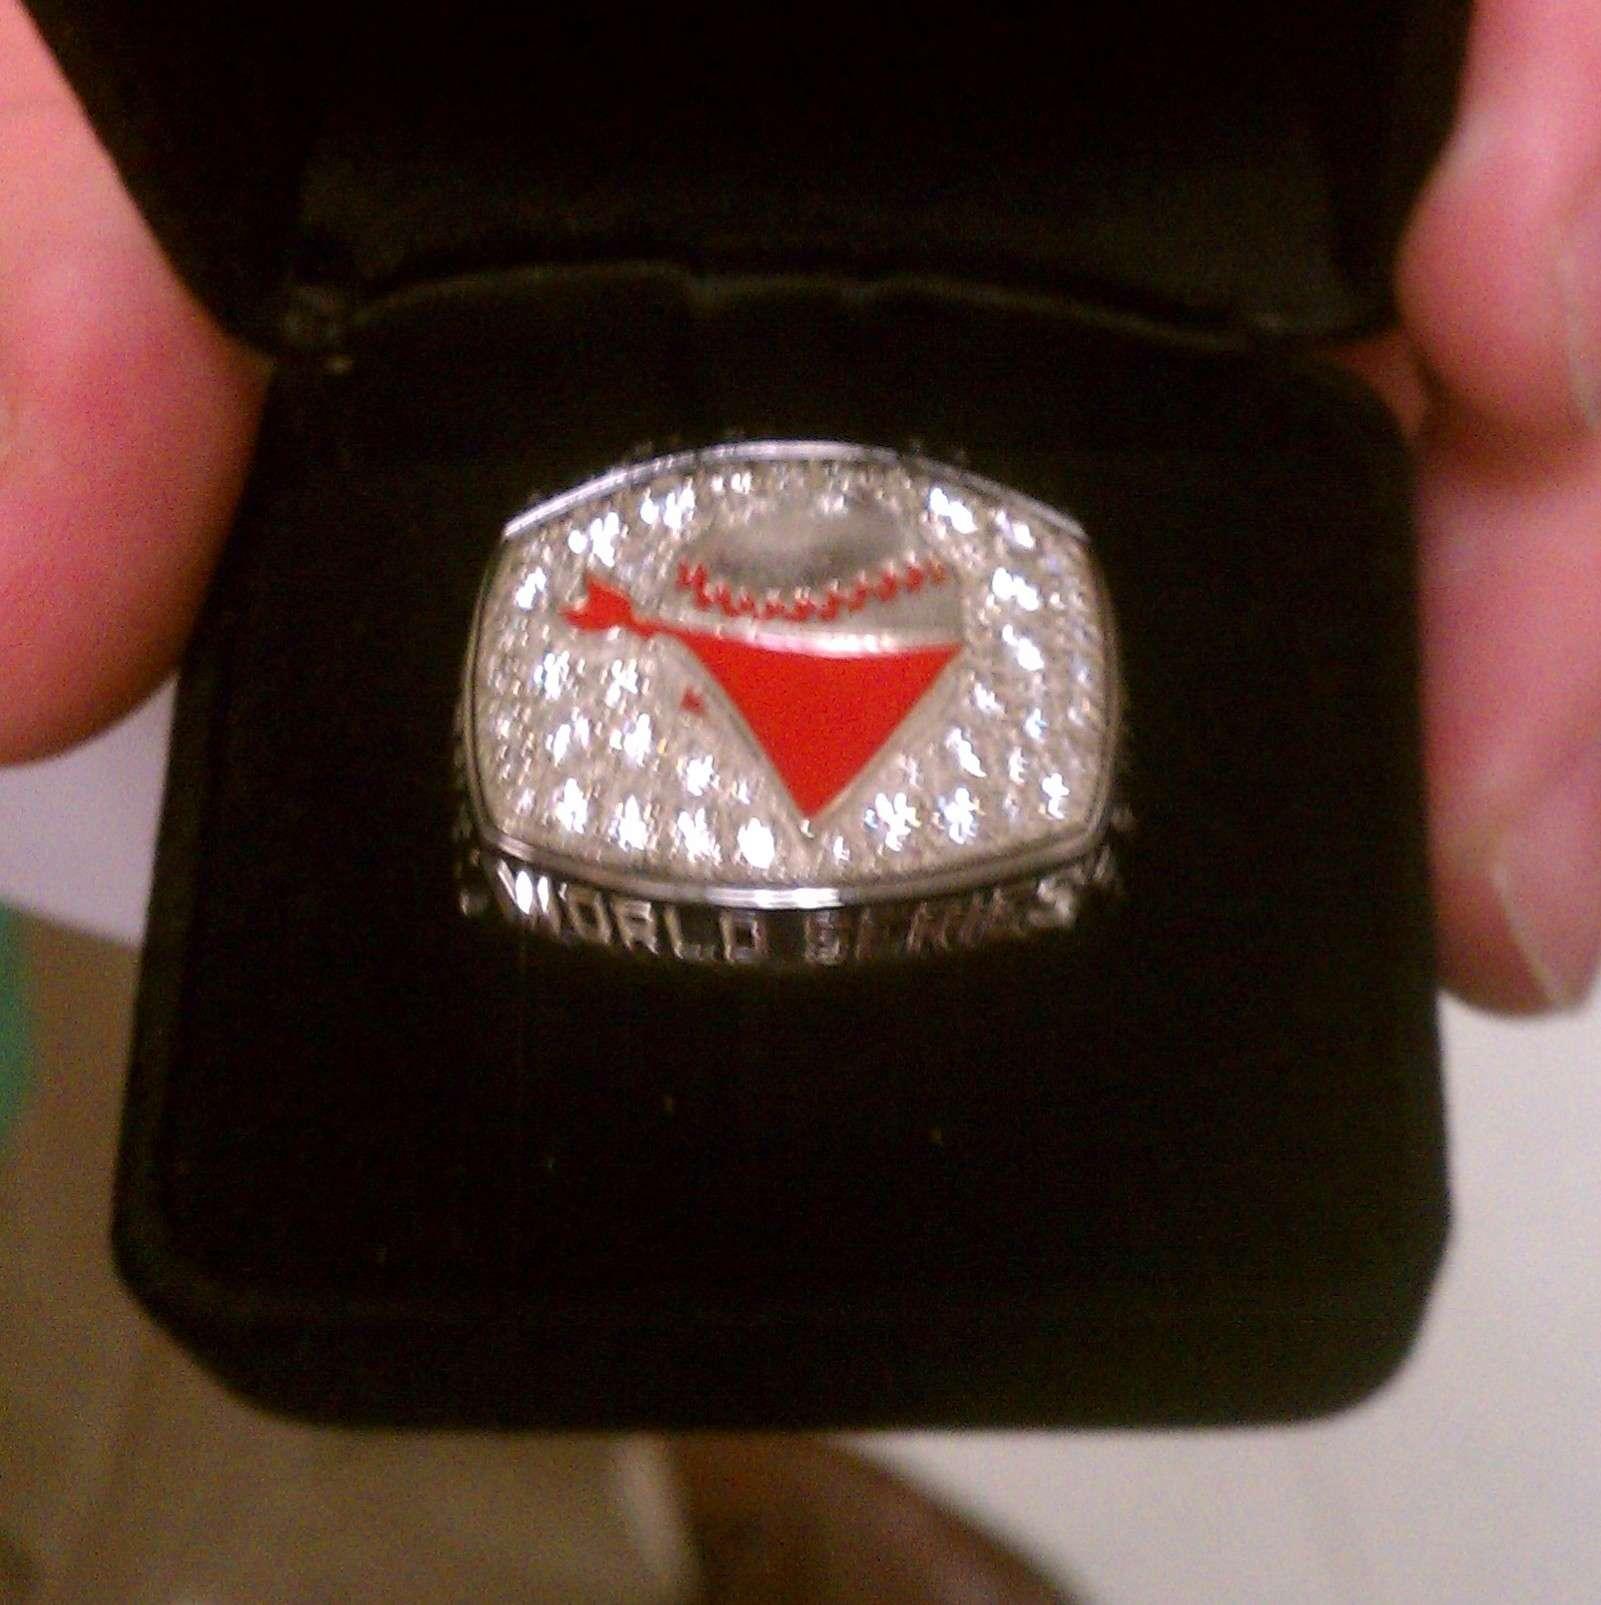 2013 Championship Ring